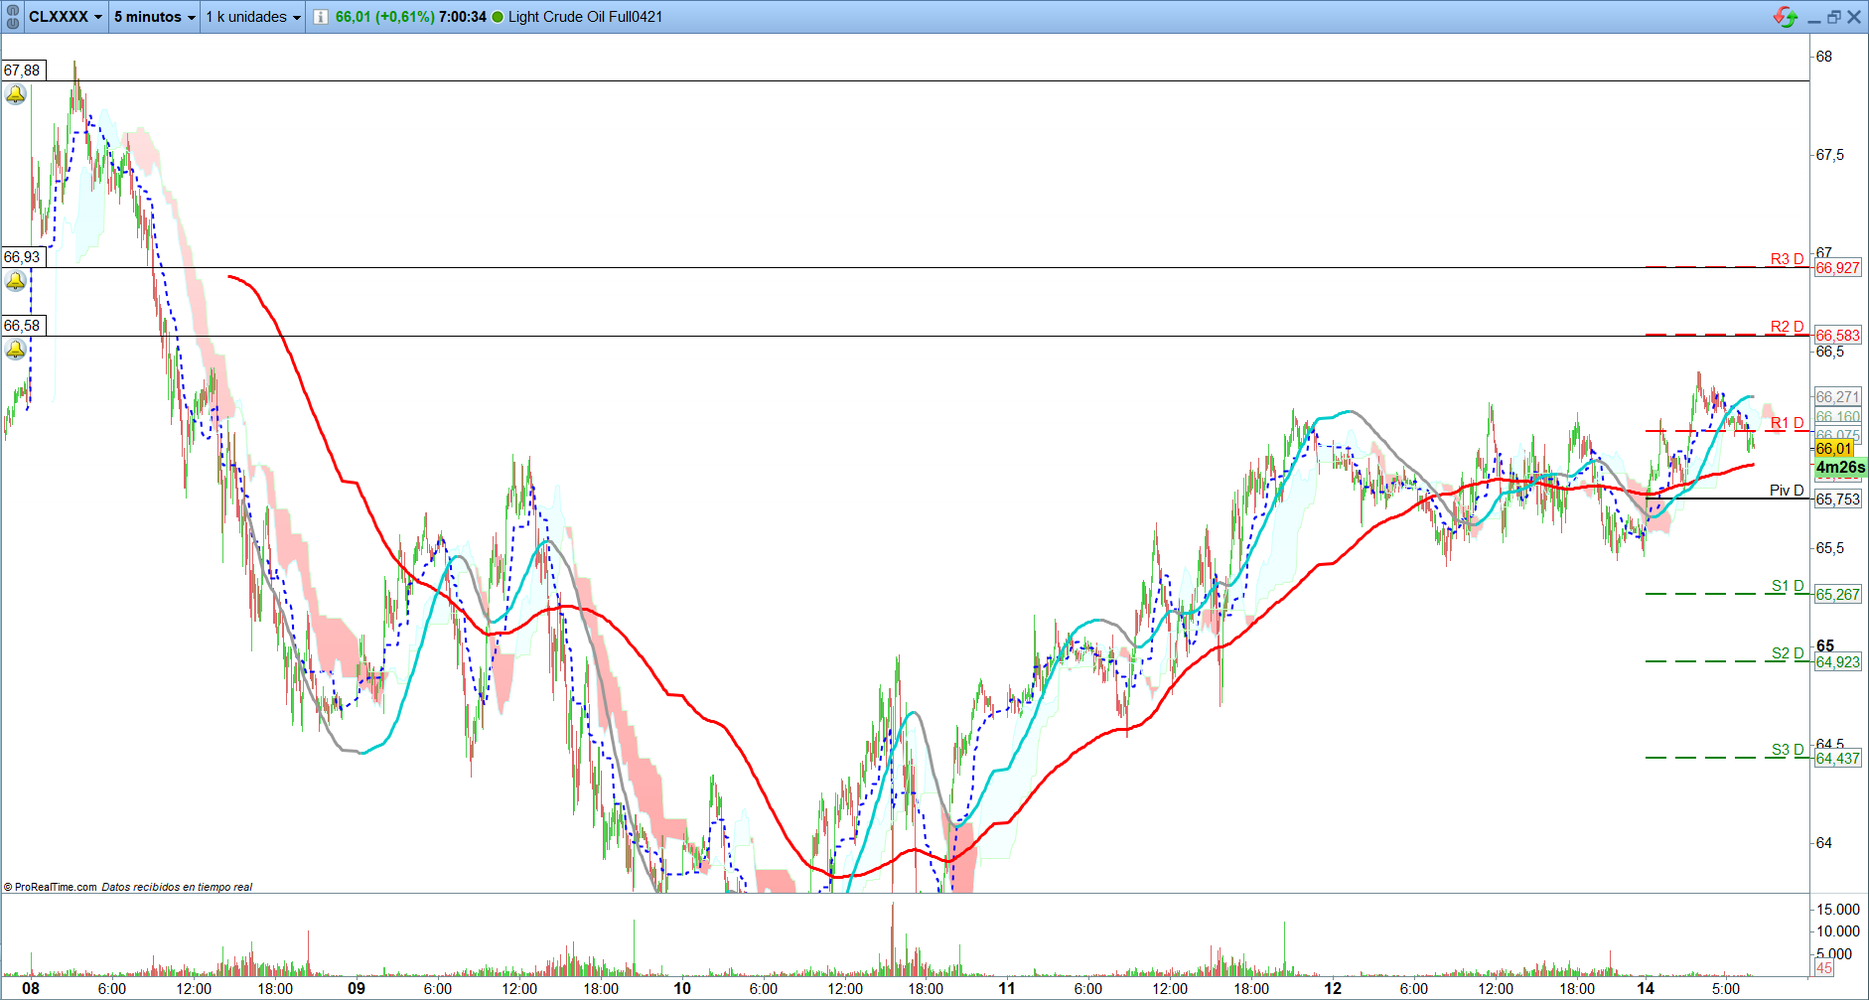 Petróleo. Trading de corto plazo. Scalping